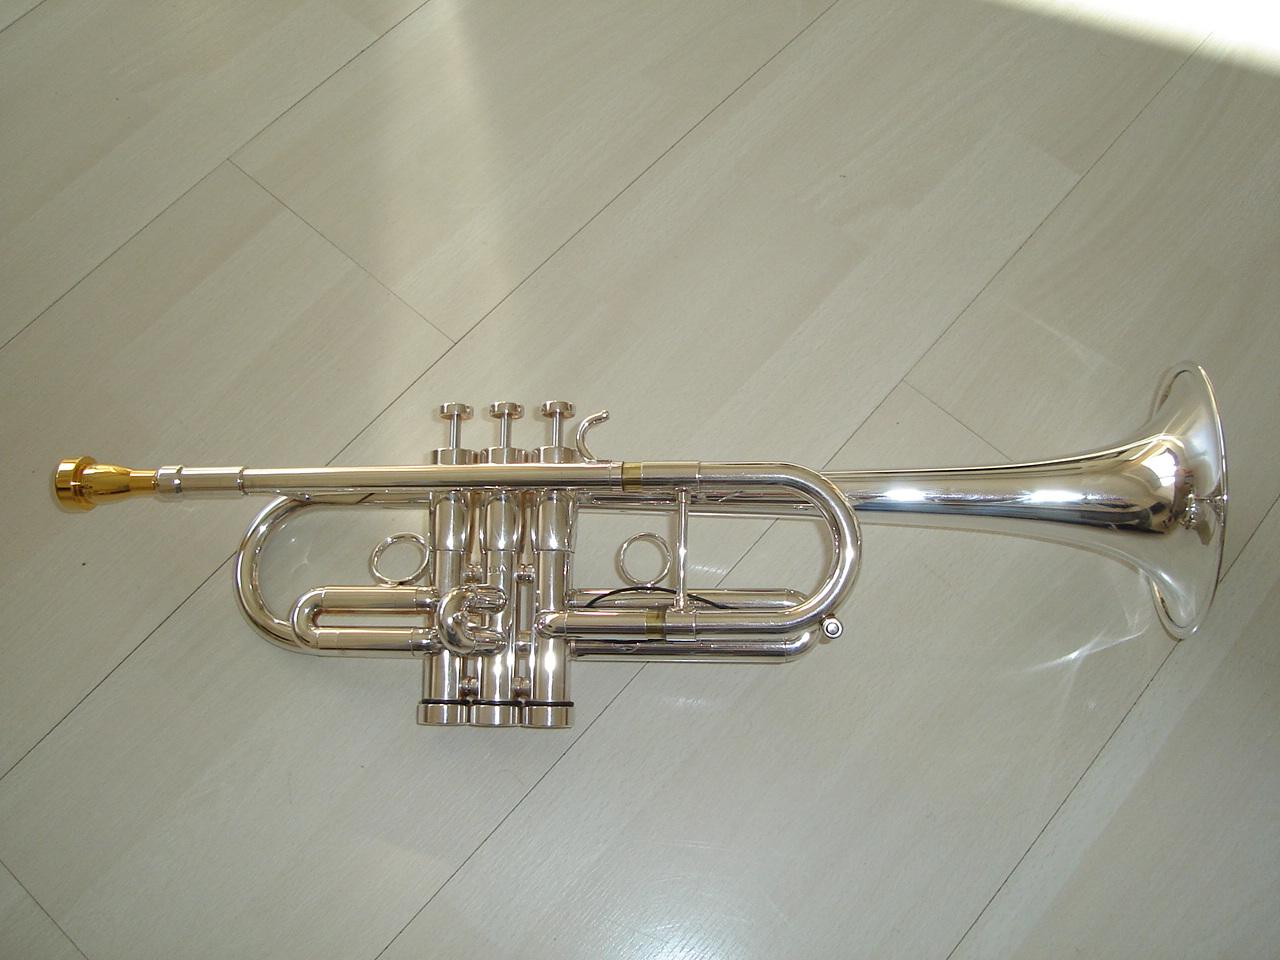 monette trumpet for sale buy my used monette stc c trumpet. Black Bedroom Furniture Sets. Home Design Ideas